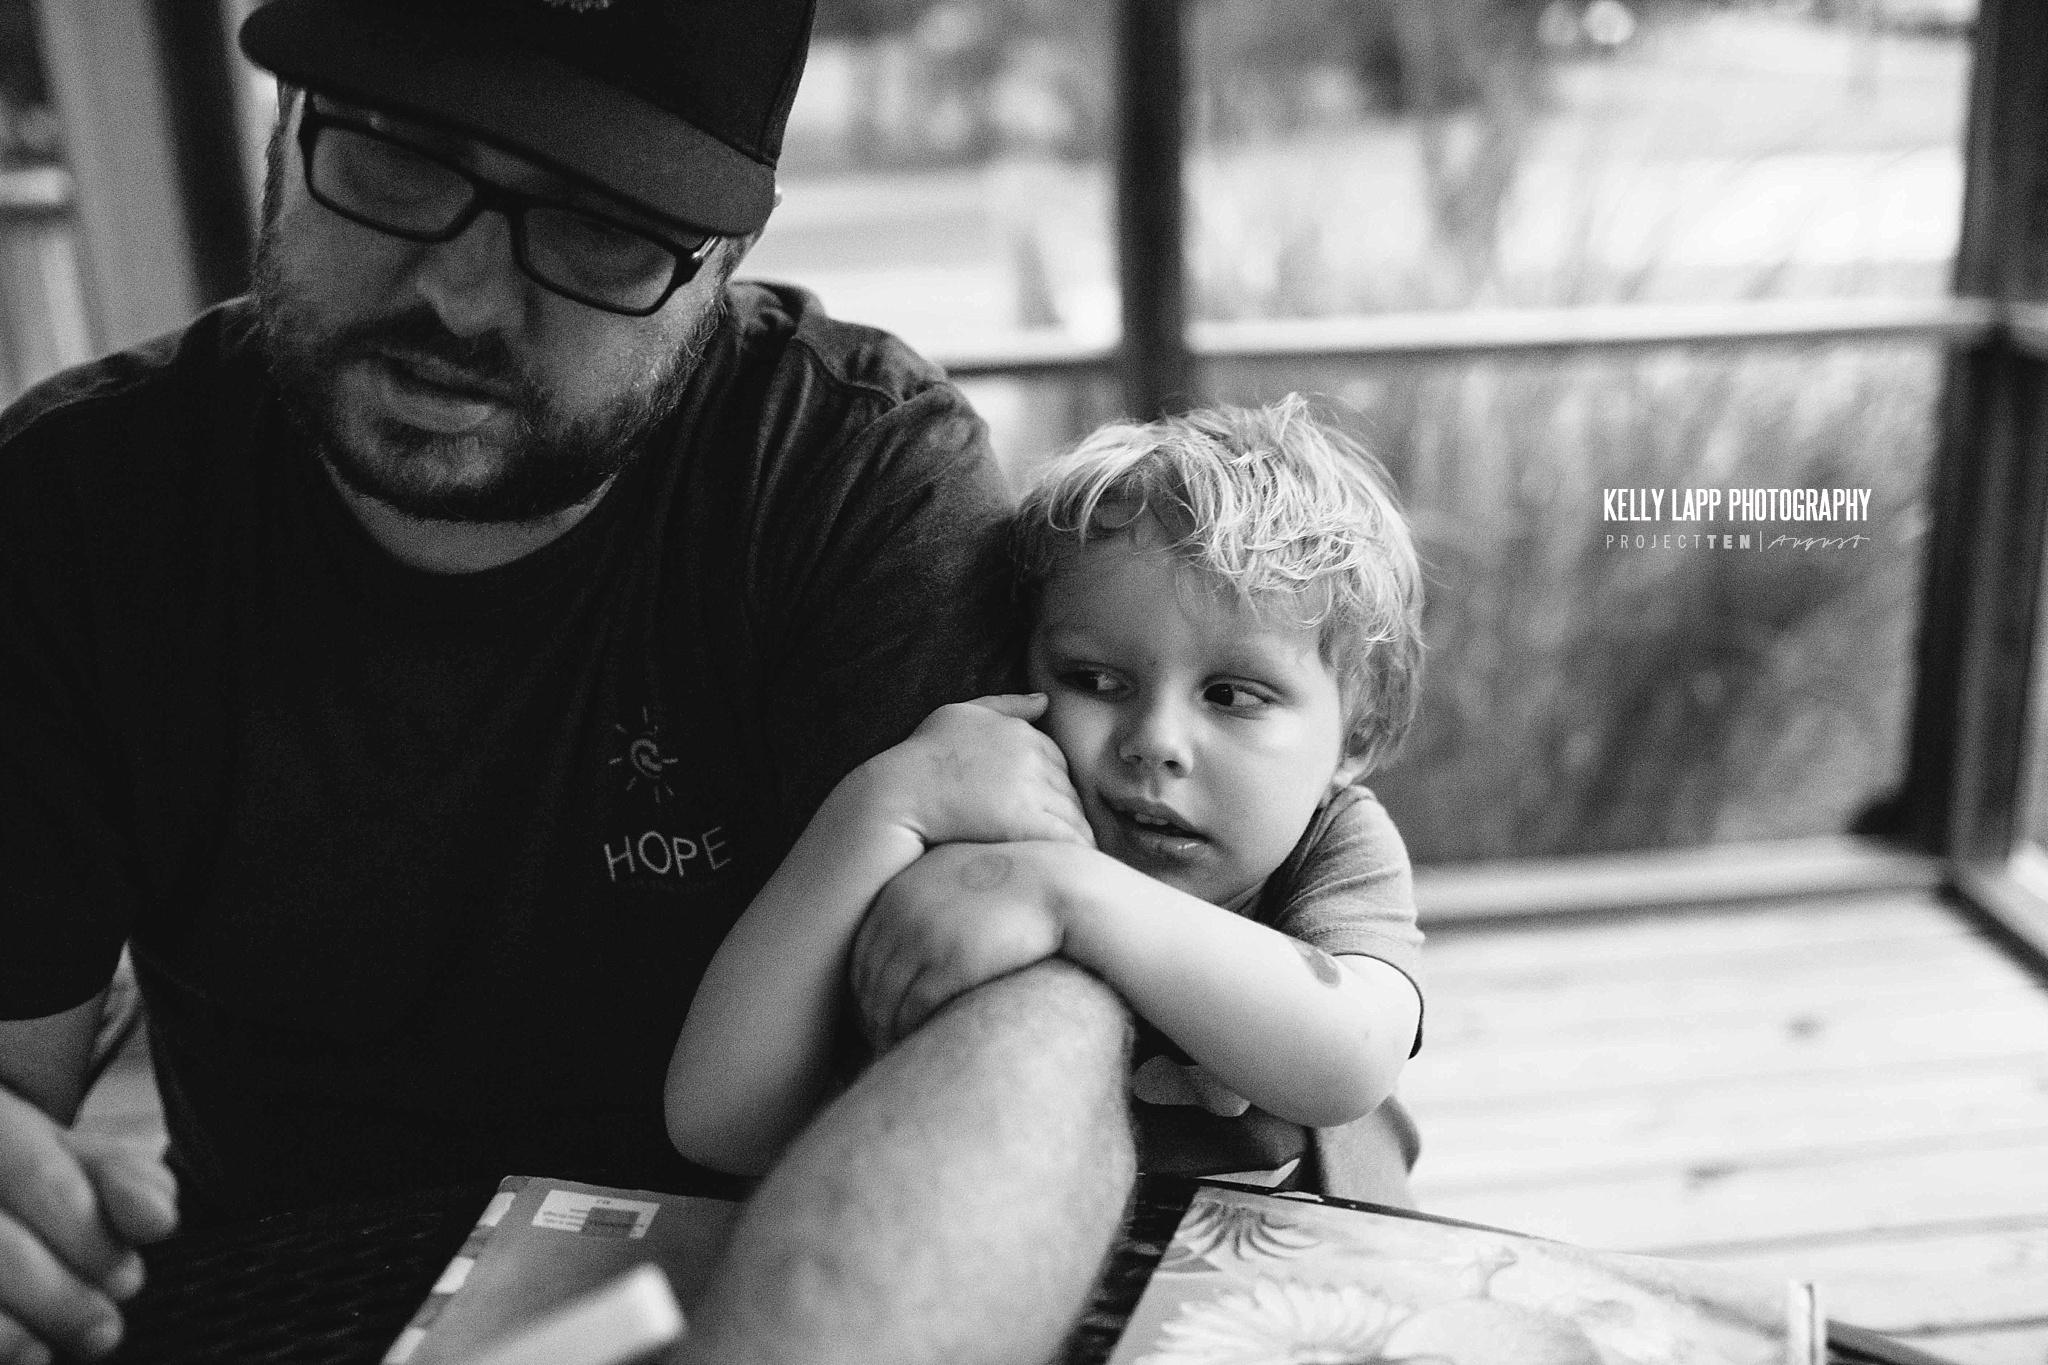 KellyLappPhotography_familyphotojournalism_projectten_august2017_08.JPG